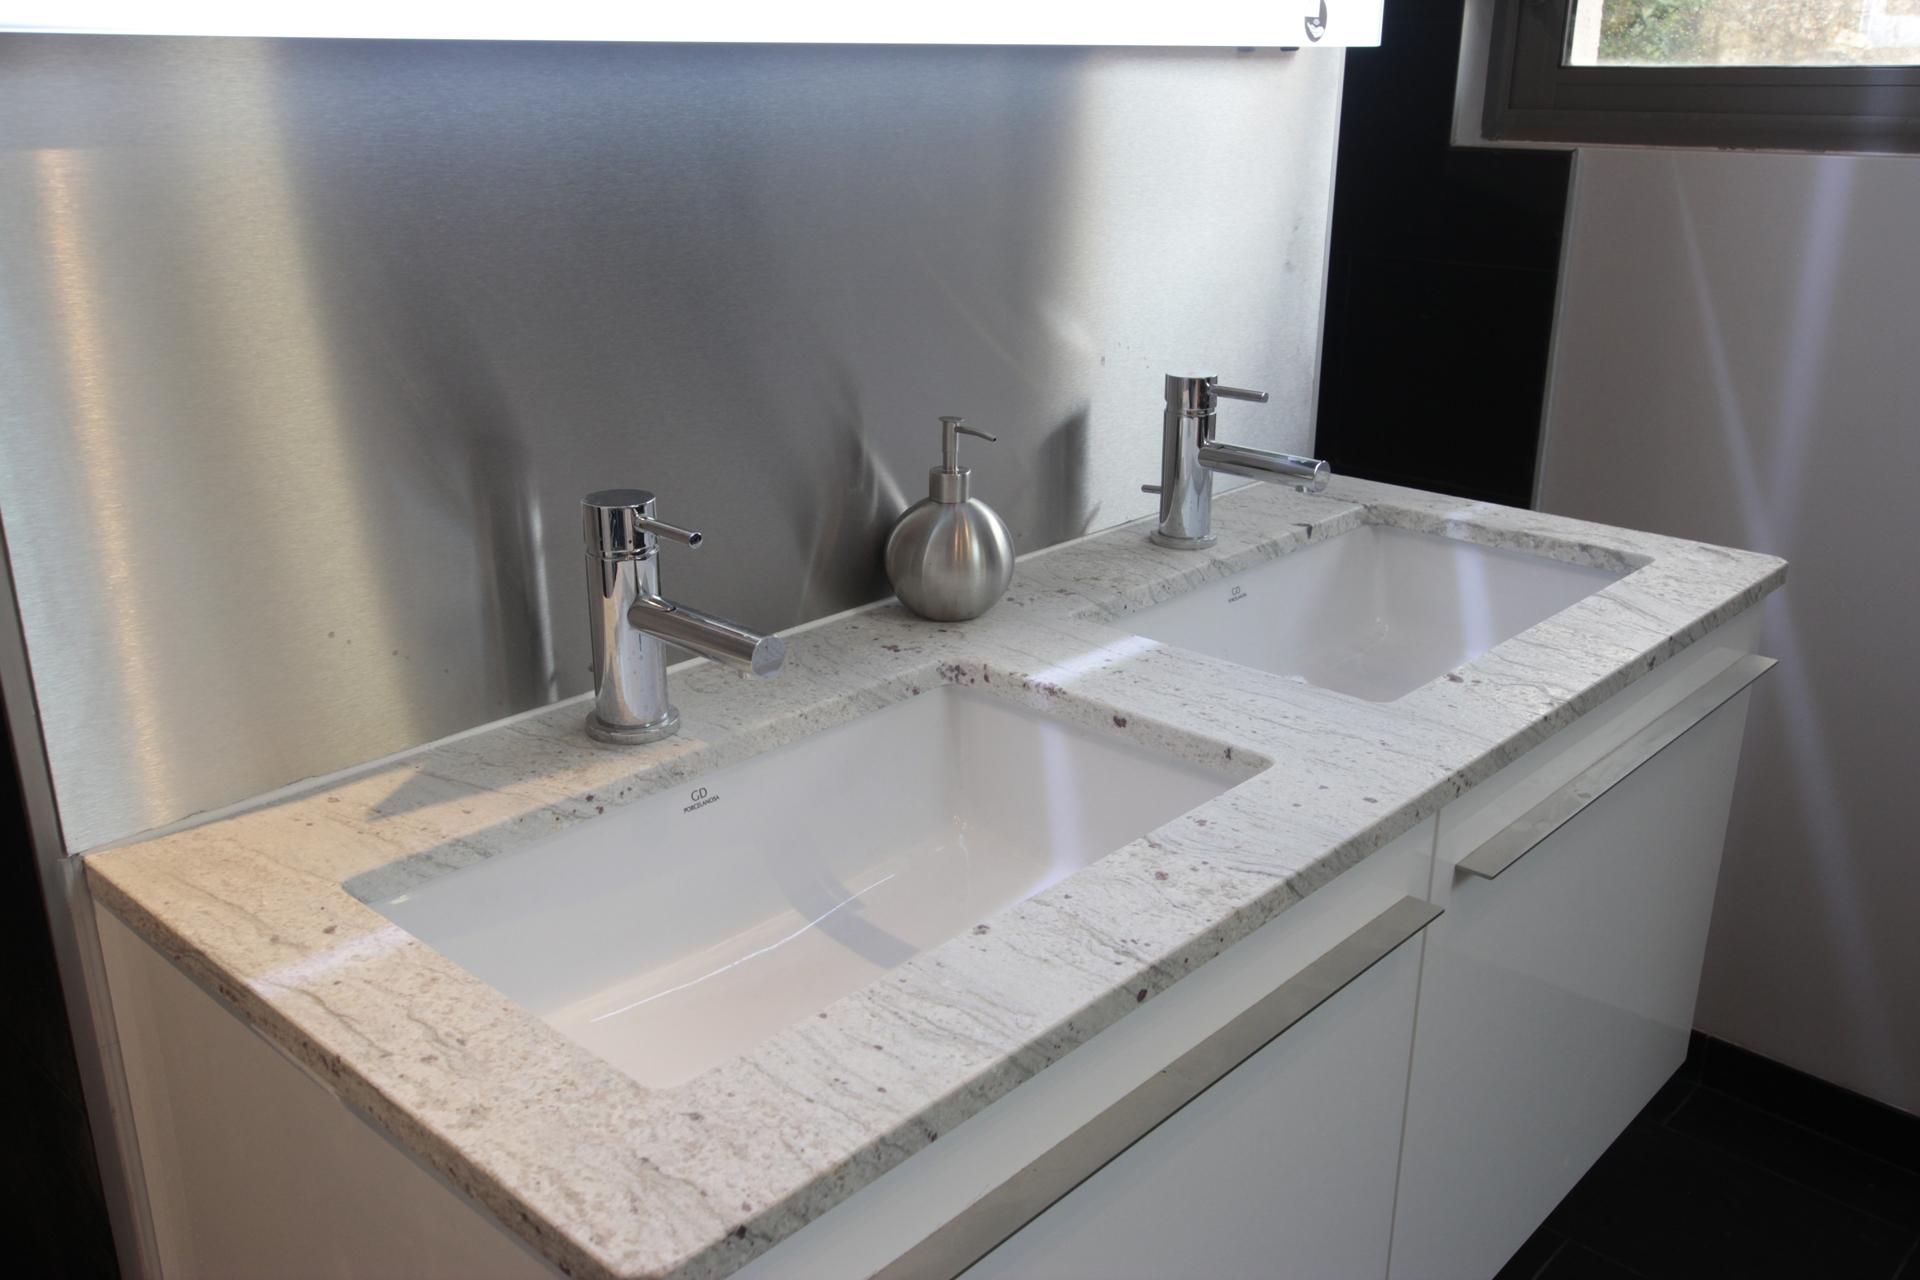 Plan de vasque porcelanosa jou plomberie chauffage - Meuble de salle de bain porcelanosa ...